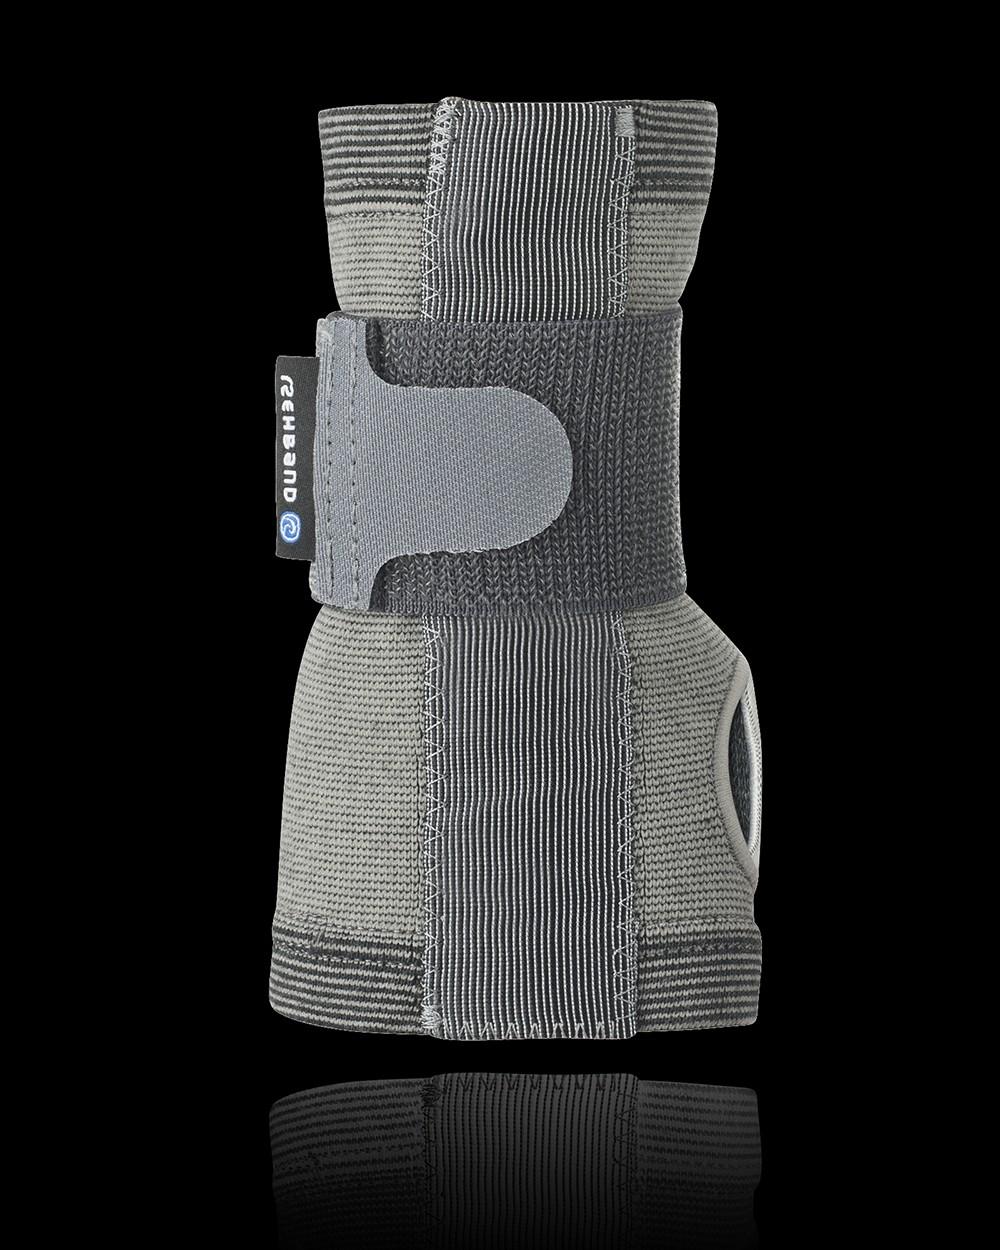 Rehband QD Knitted Wrist Support